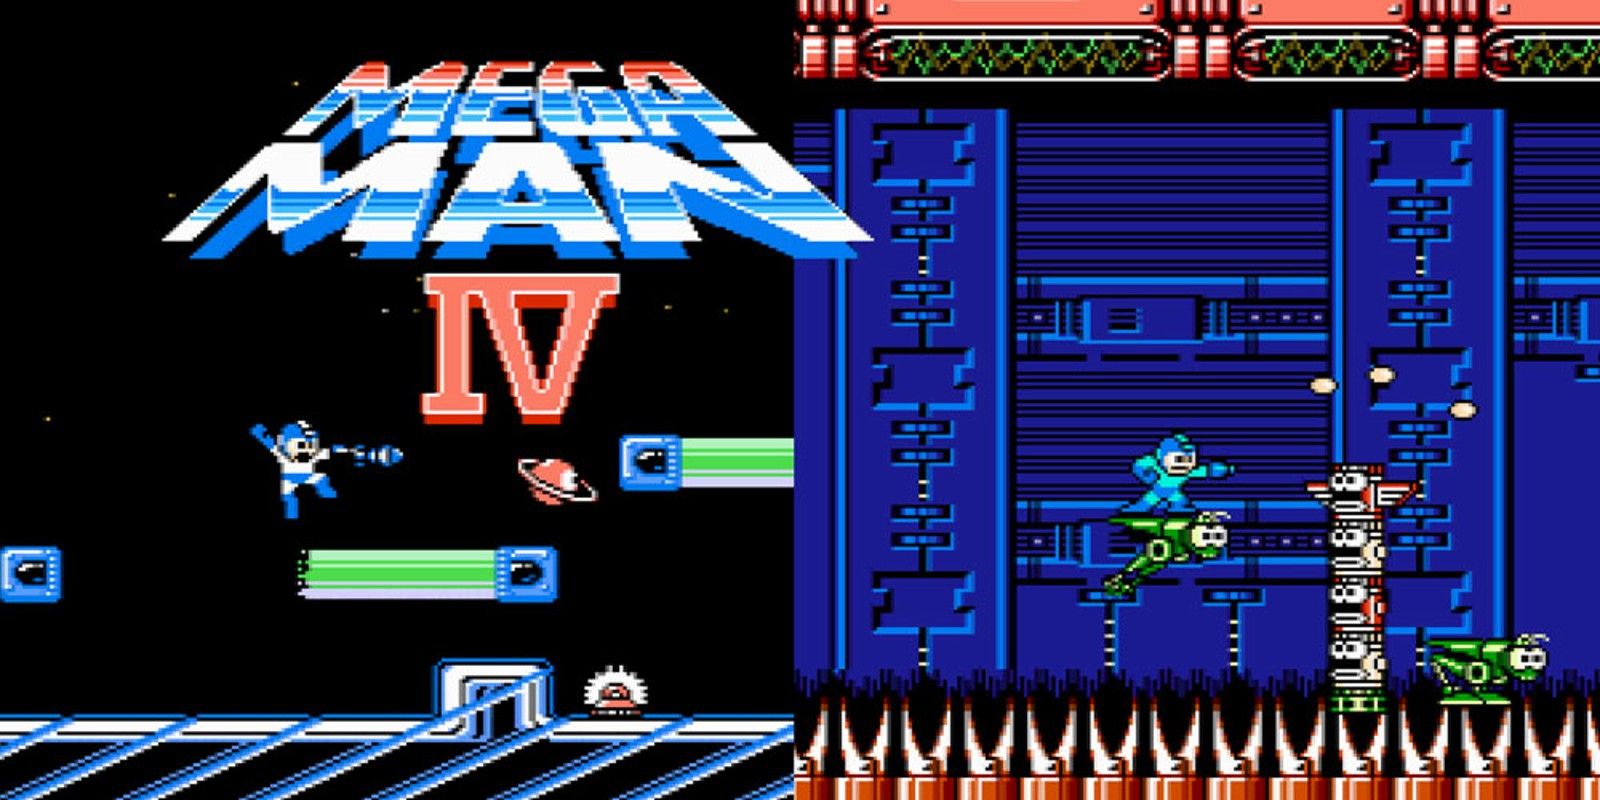 Mega man 4 nes games nintendo - Megaman x virtual console ...